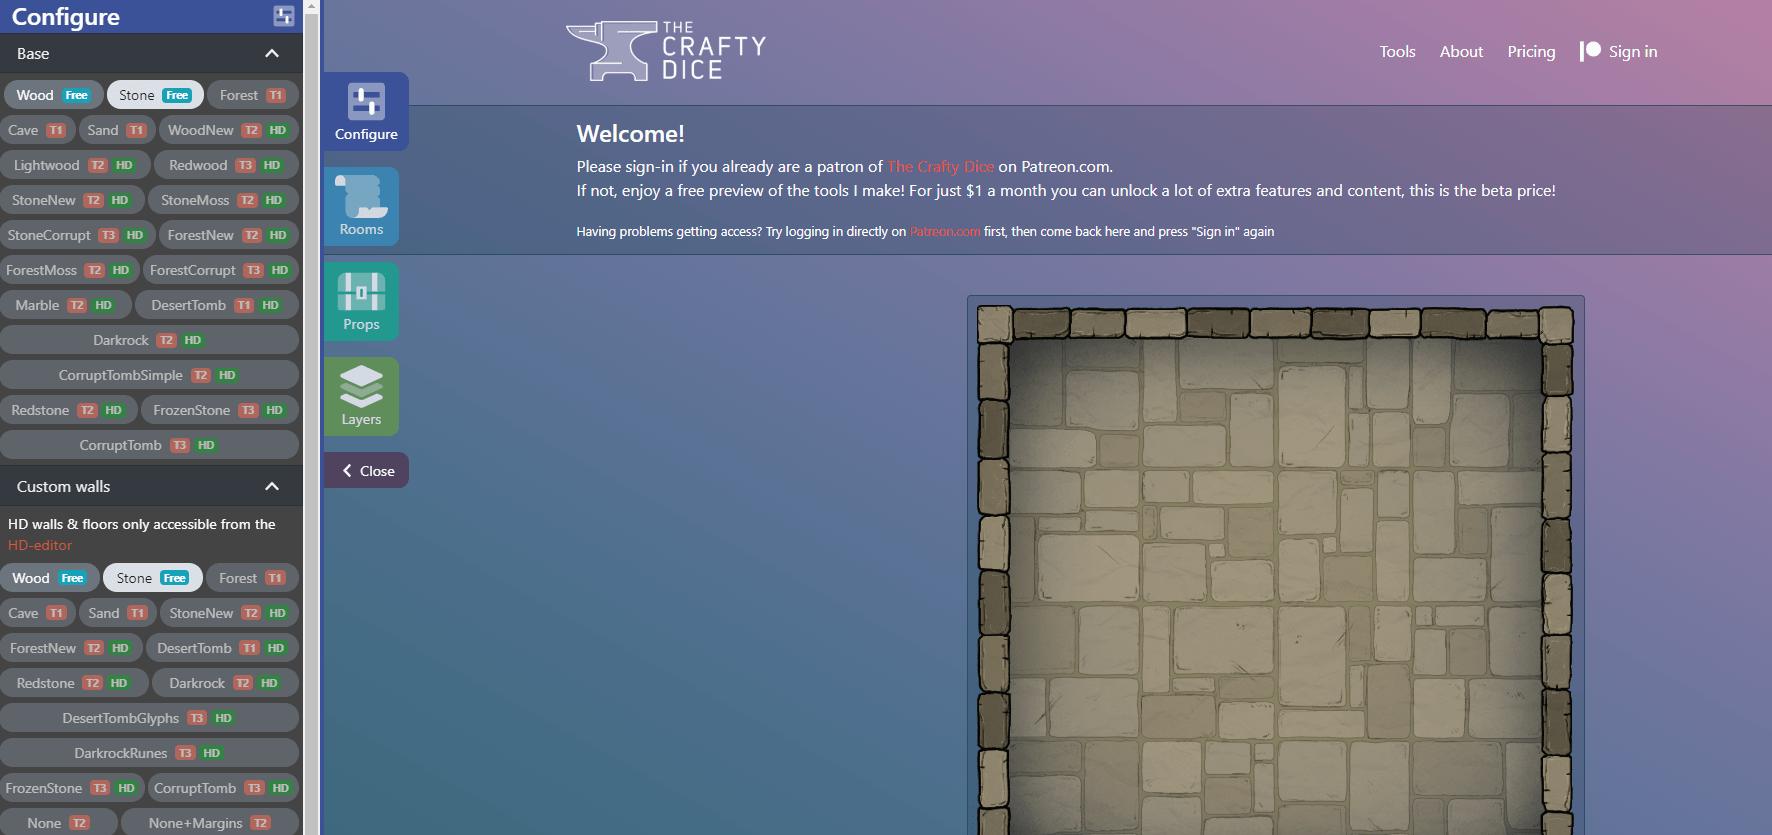 The Crafty Dice site